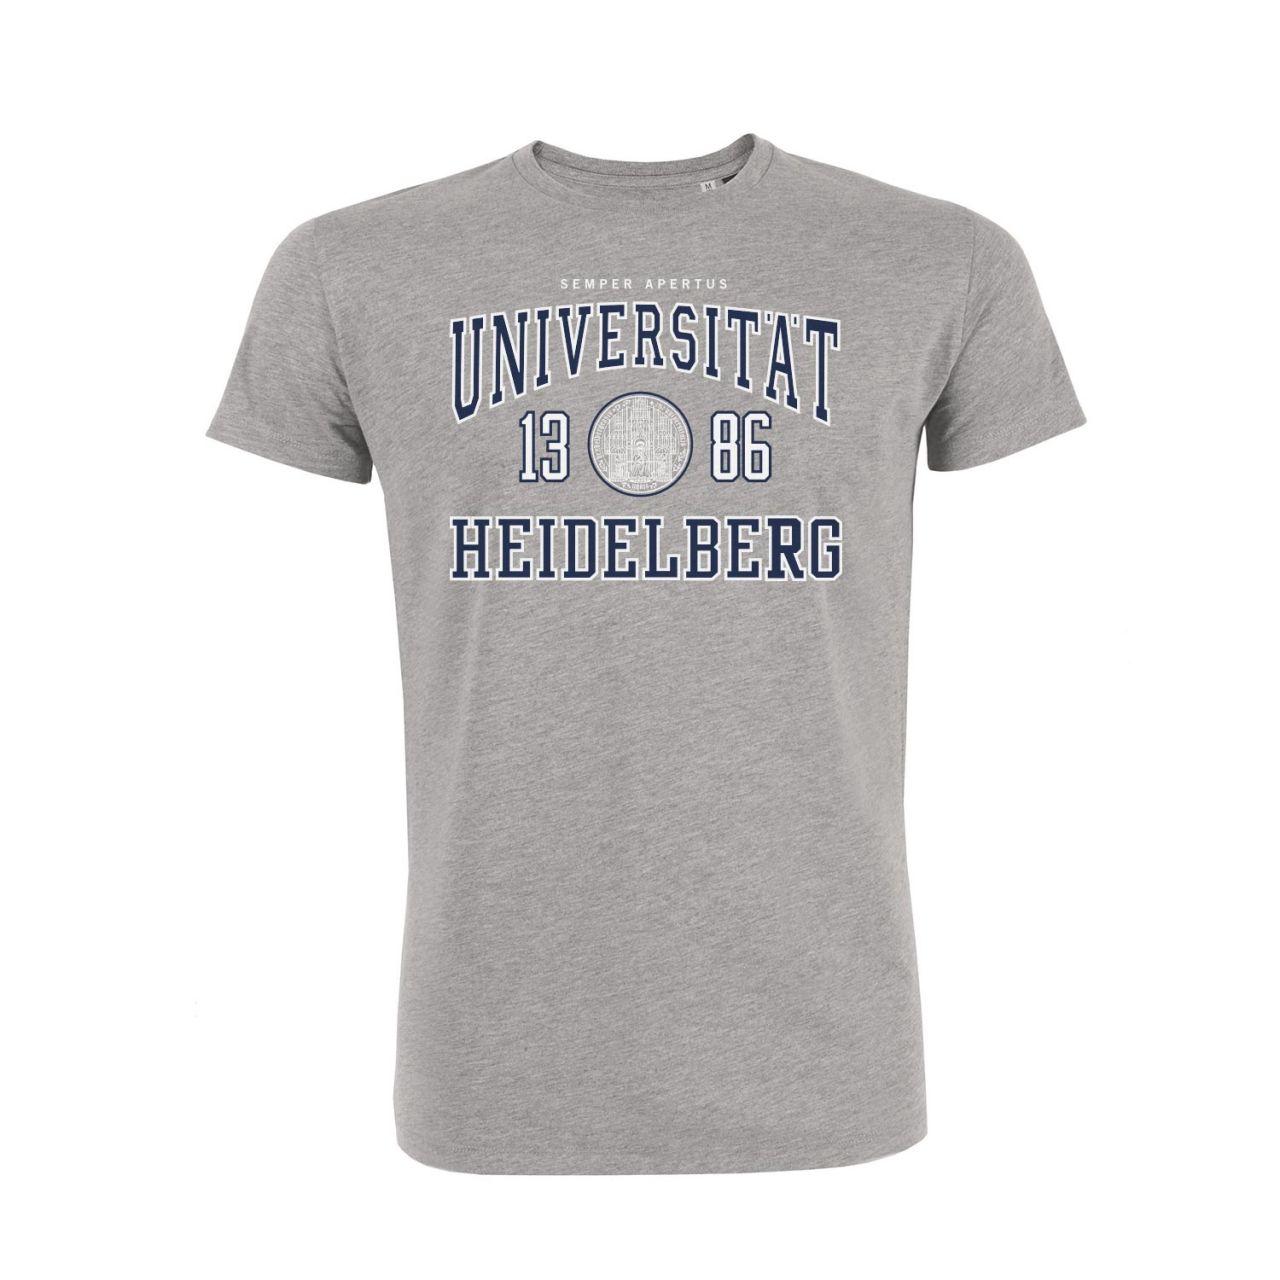 Herren Organic T-Shirt, heather grey, classic